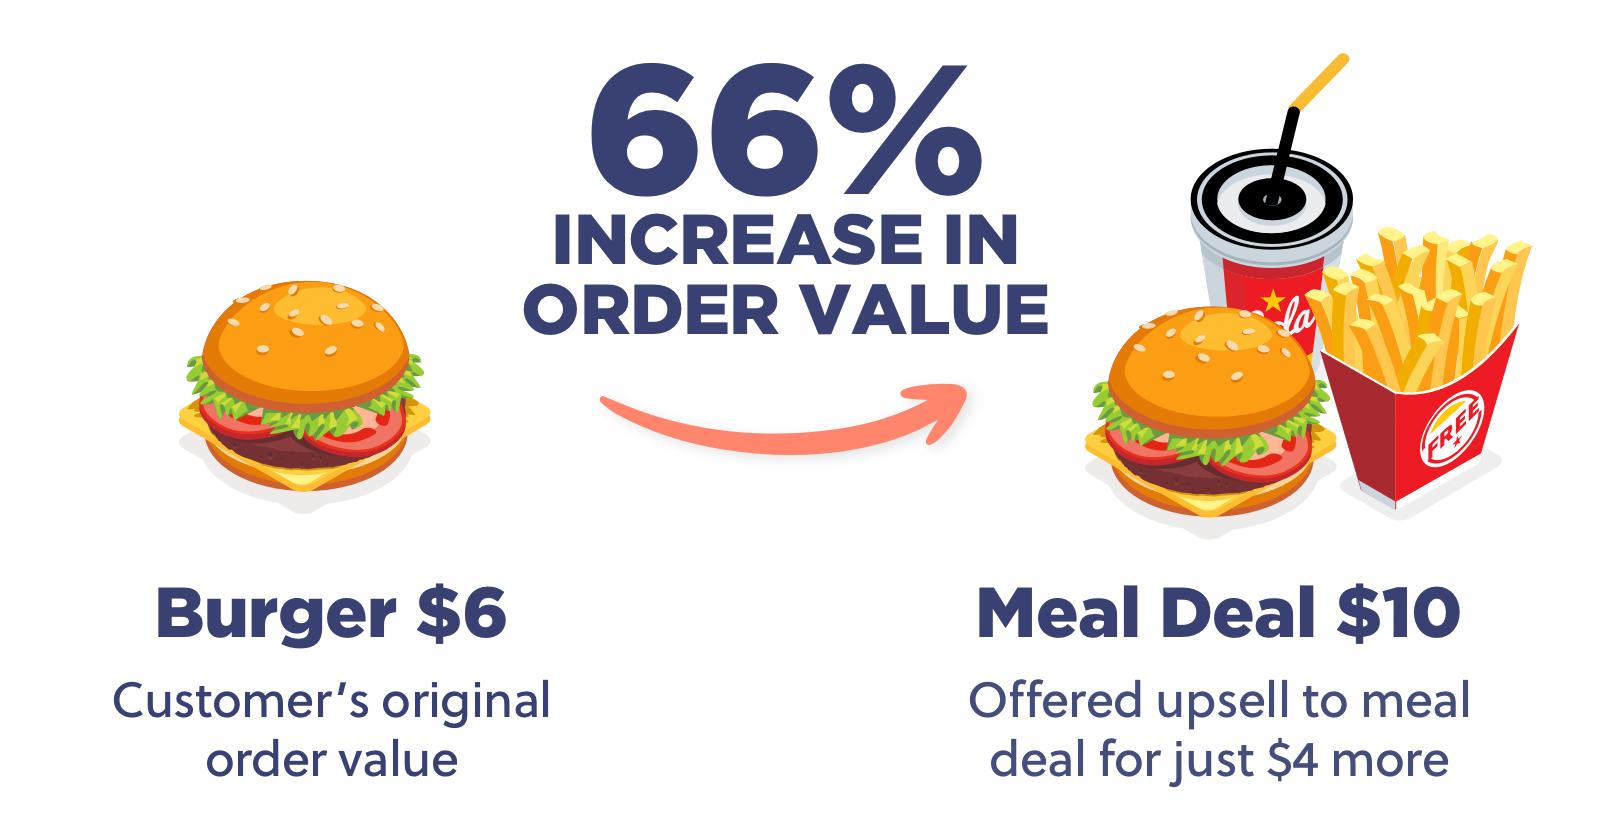 66% increase in order value